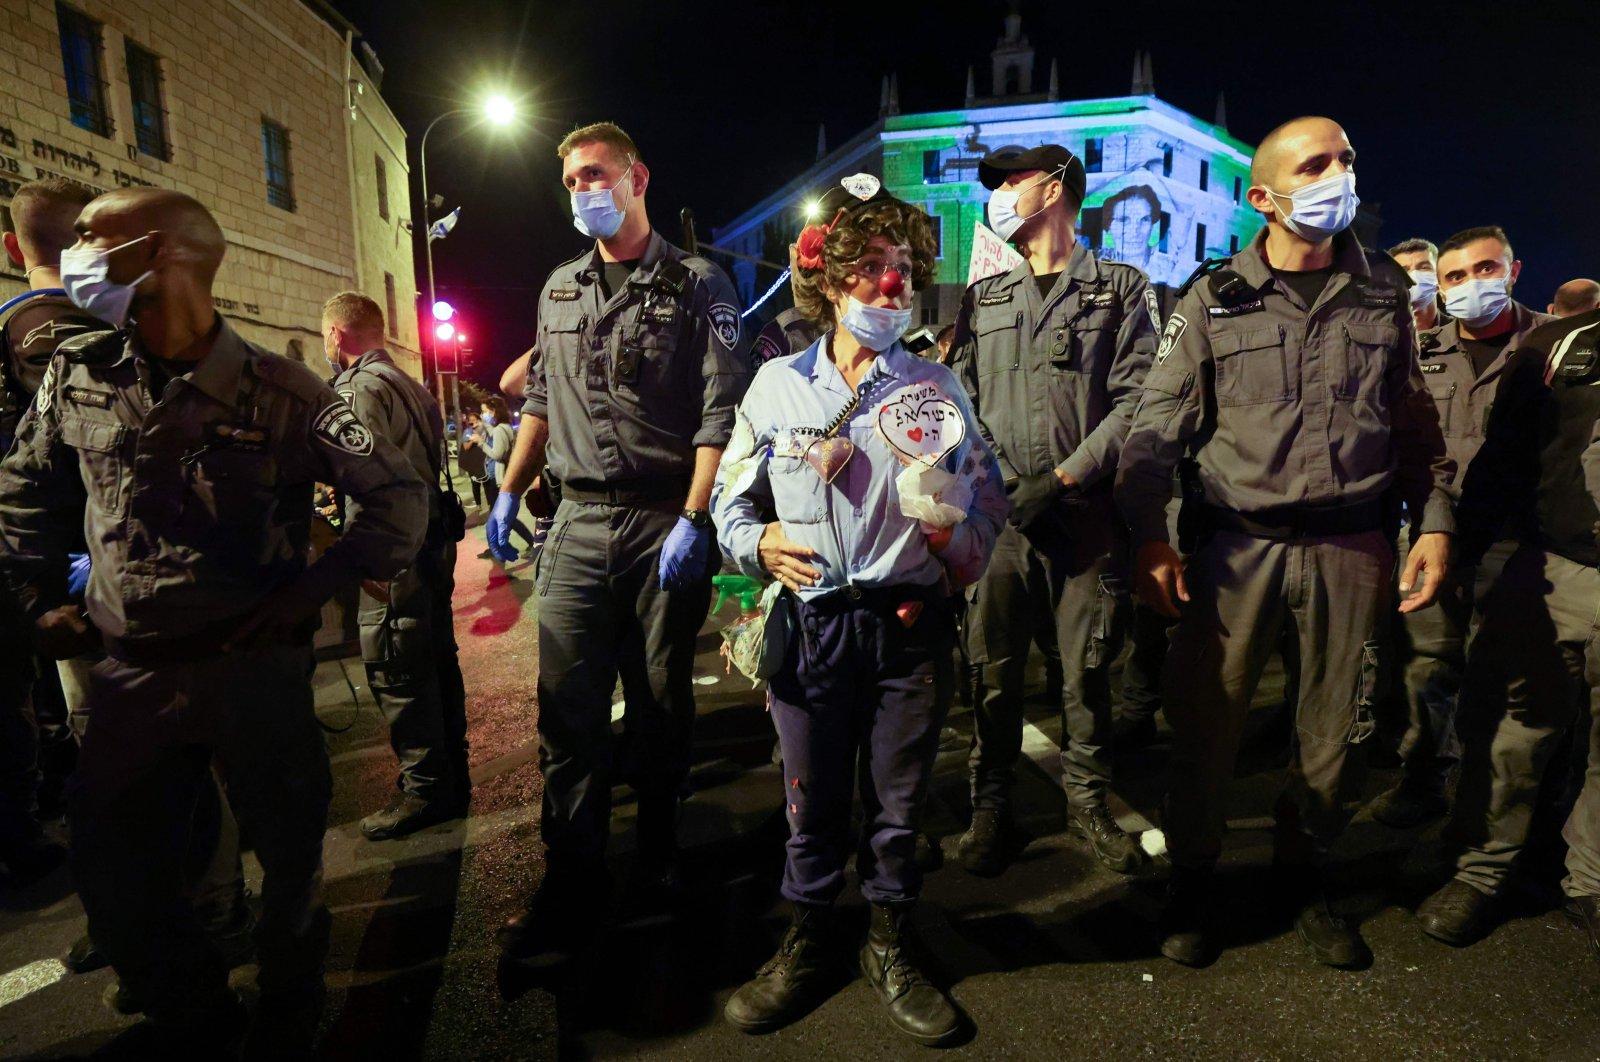 An Israeli protester stand amongst policemen during a demonstration in front of Prime Minister Benjamin Netanyahu's residence, Jerusalem, Sept. 26, 2020. (AFP Photo)